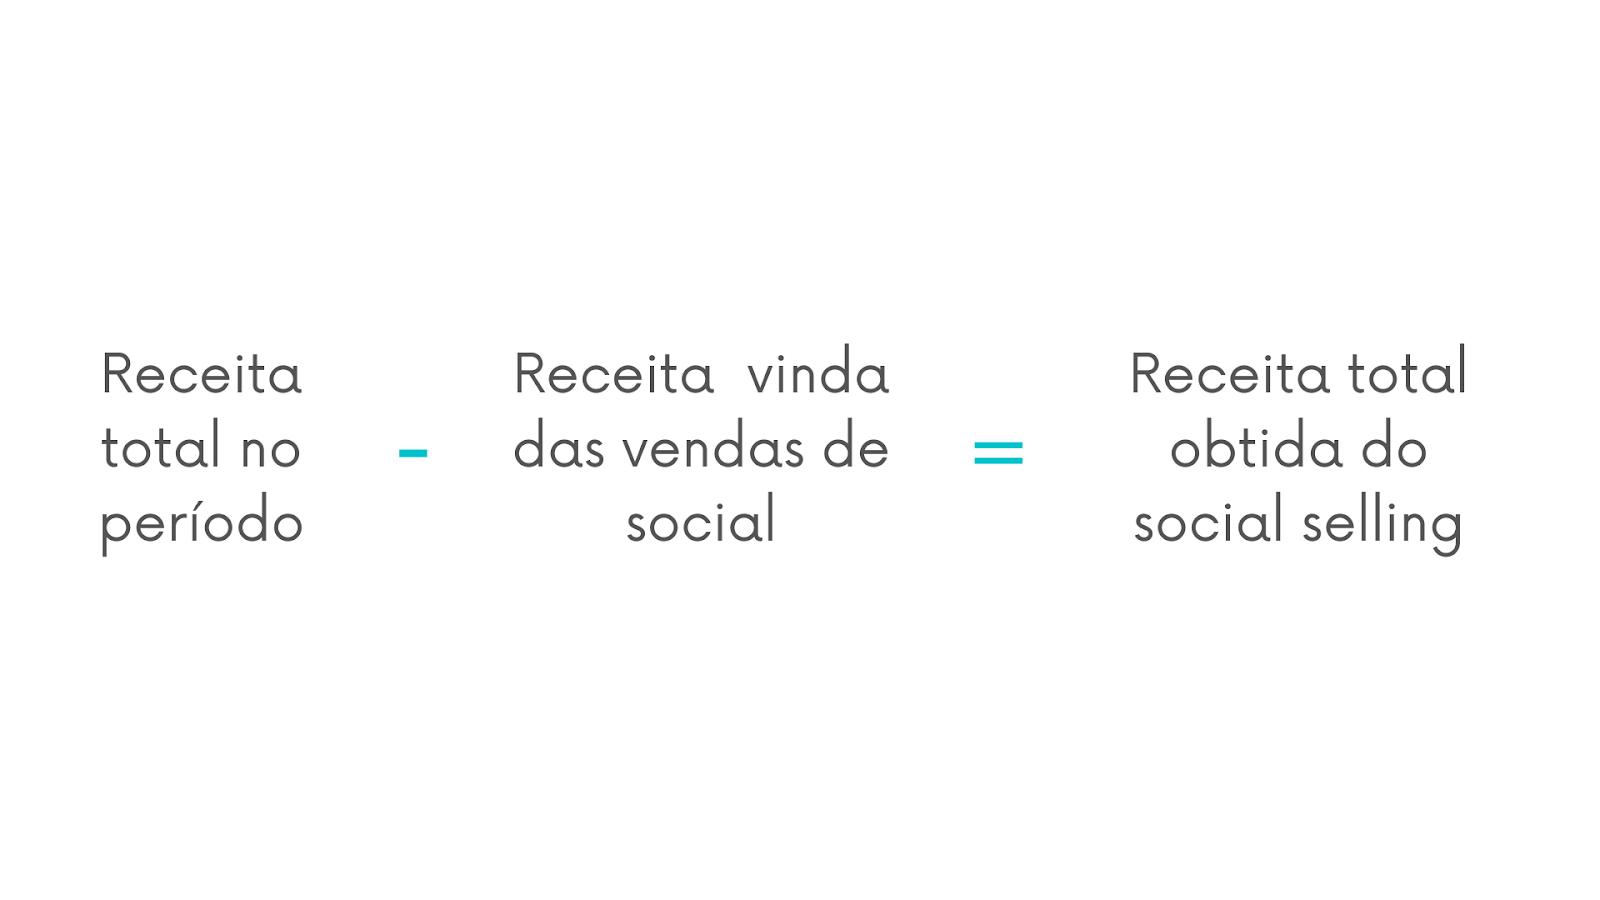 Fórmula para calcular a receita total vinda de social selling